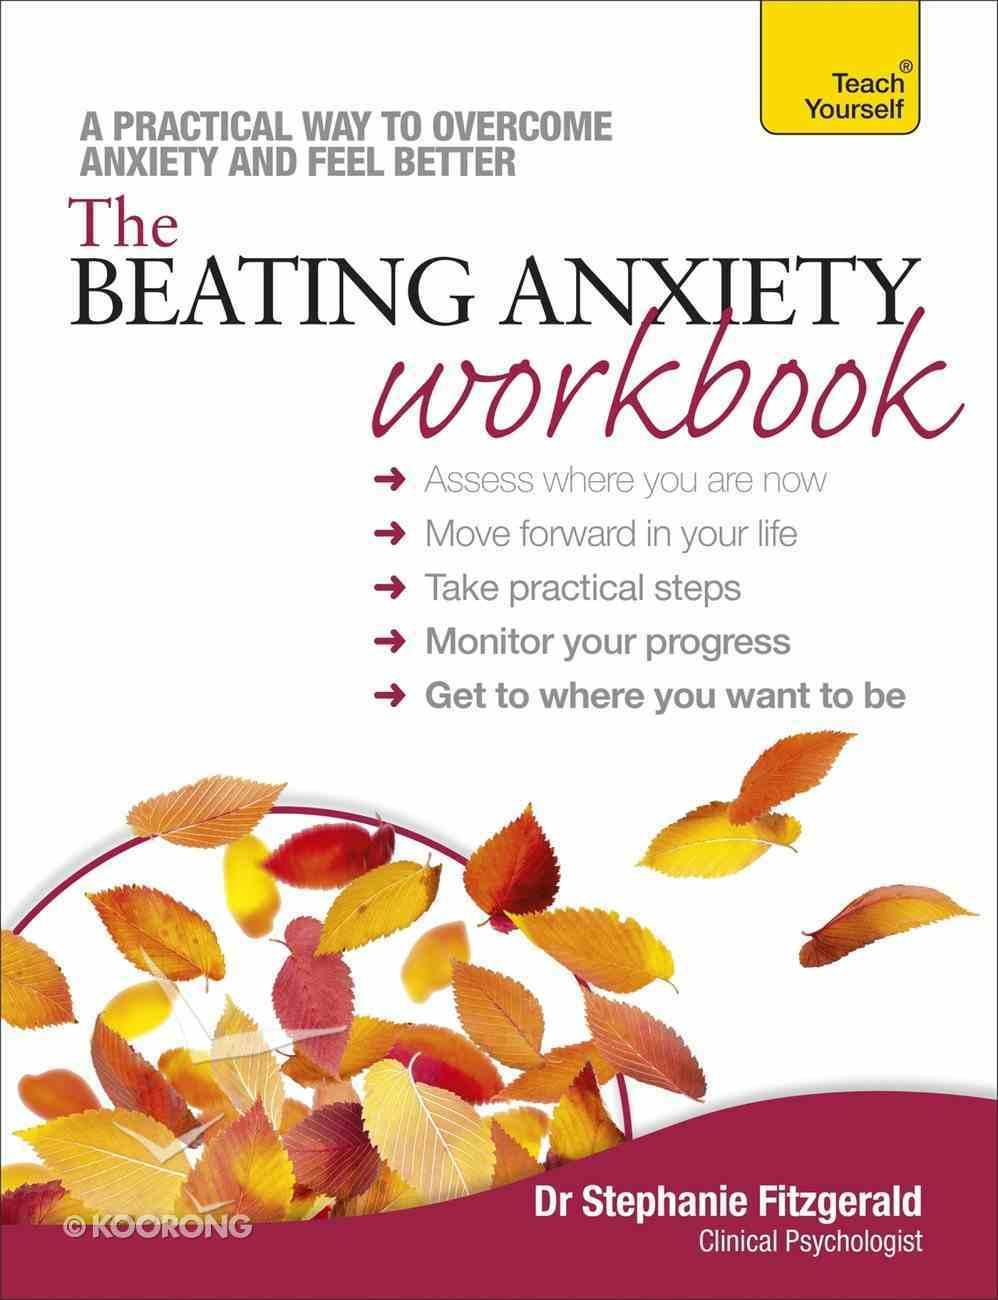 Beating Anxiety Workbook: Teach Yourself eBook